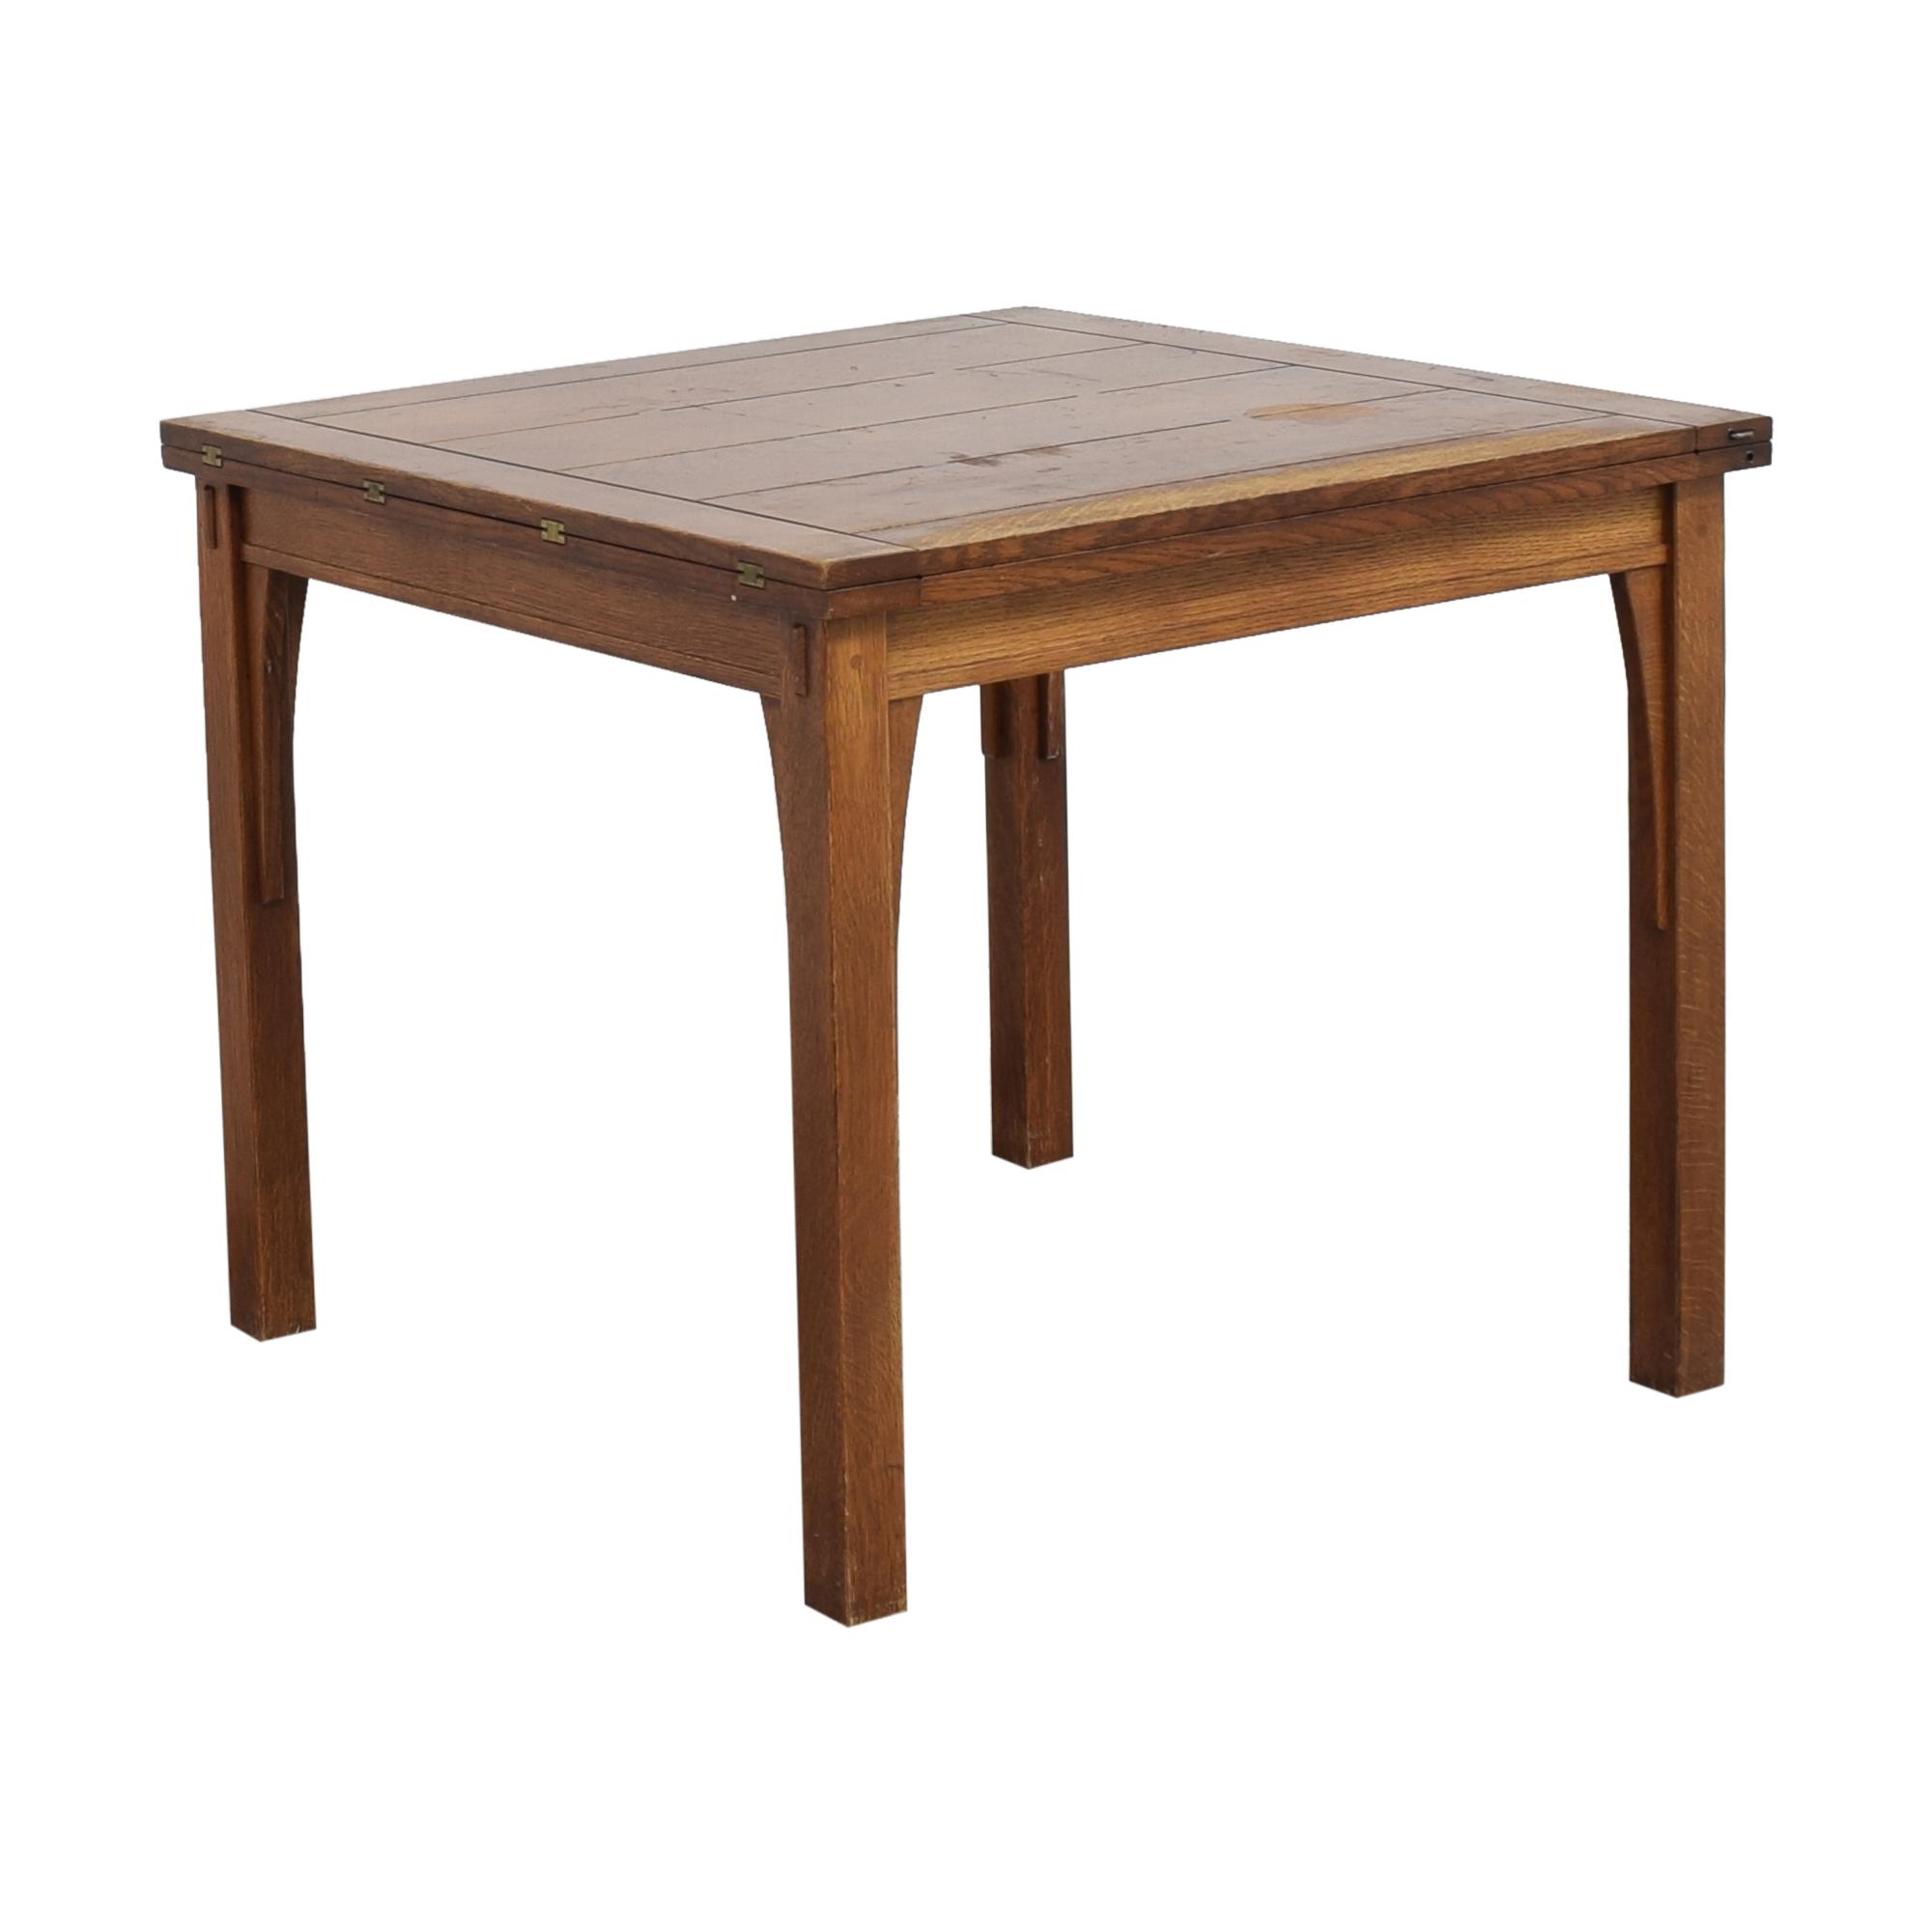 buy Stickley Furniture Stickley Furniture Mission Flip Top Extendable Table online